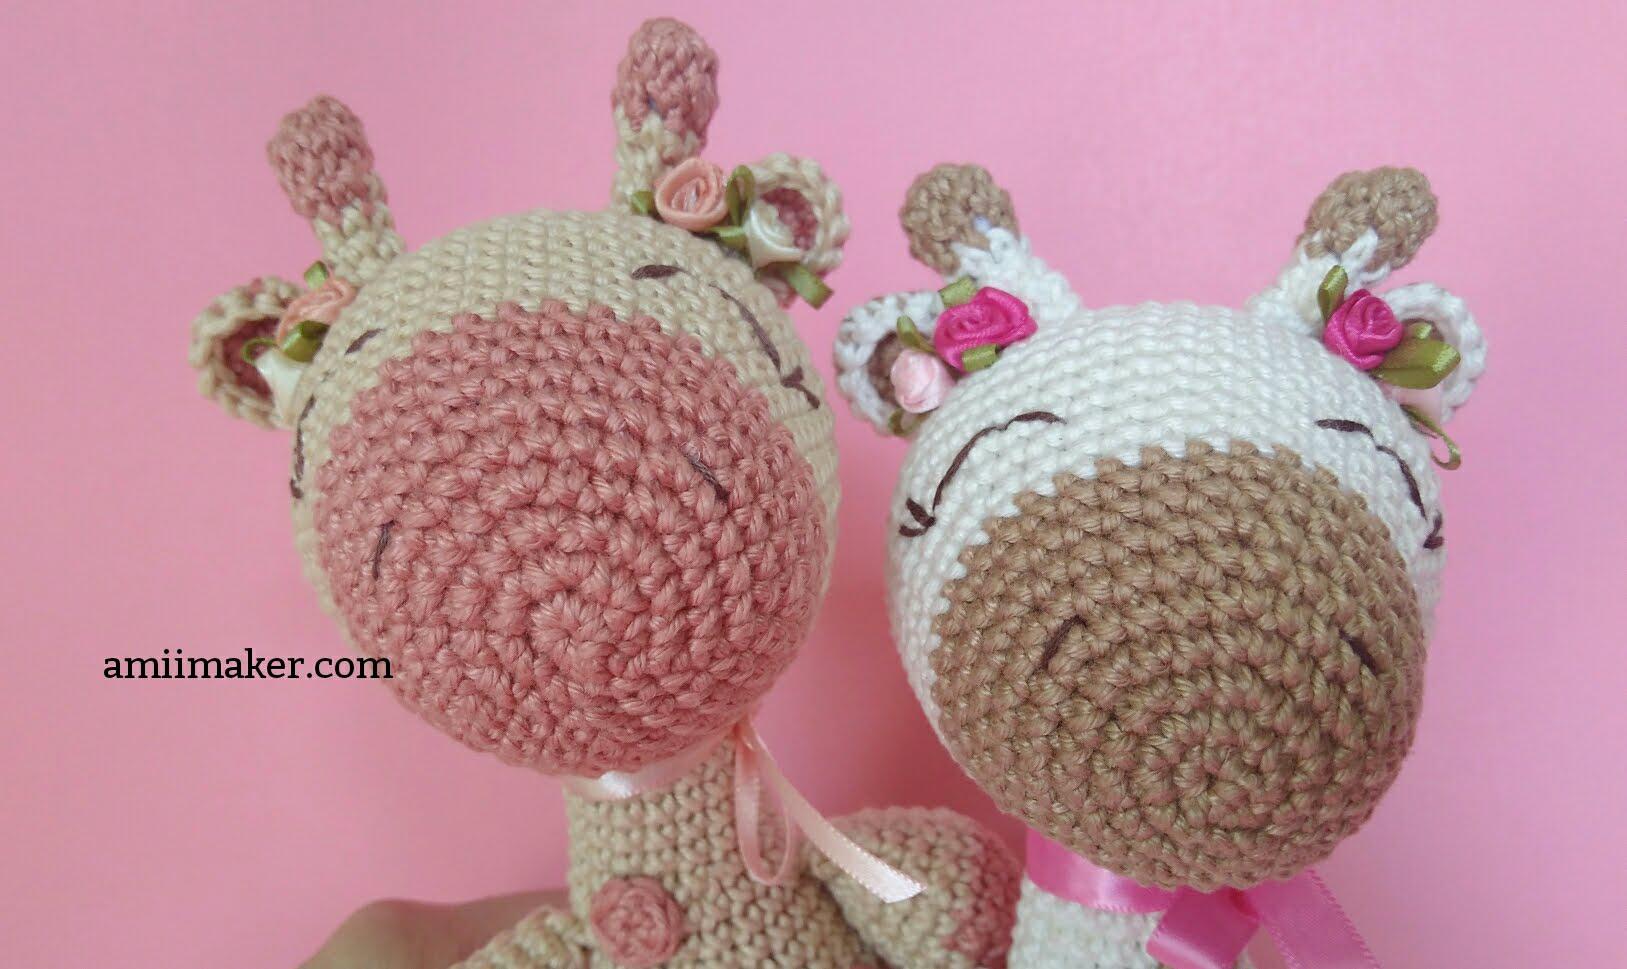 Girafa amigurumi | crochê | Tommy | Amigurumi de animais de crochê ... | 969x1627